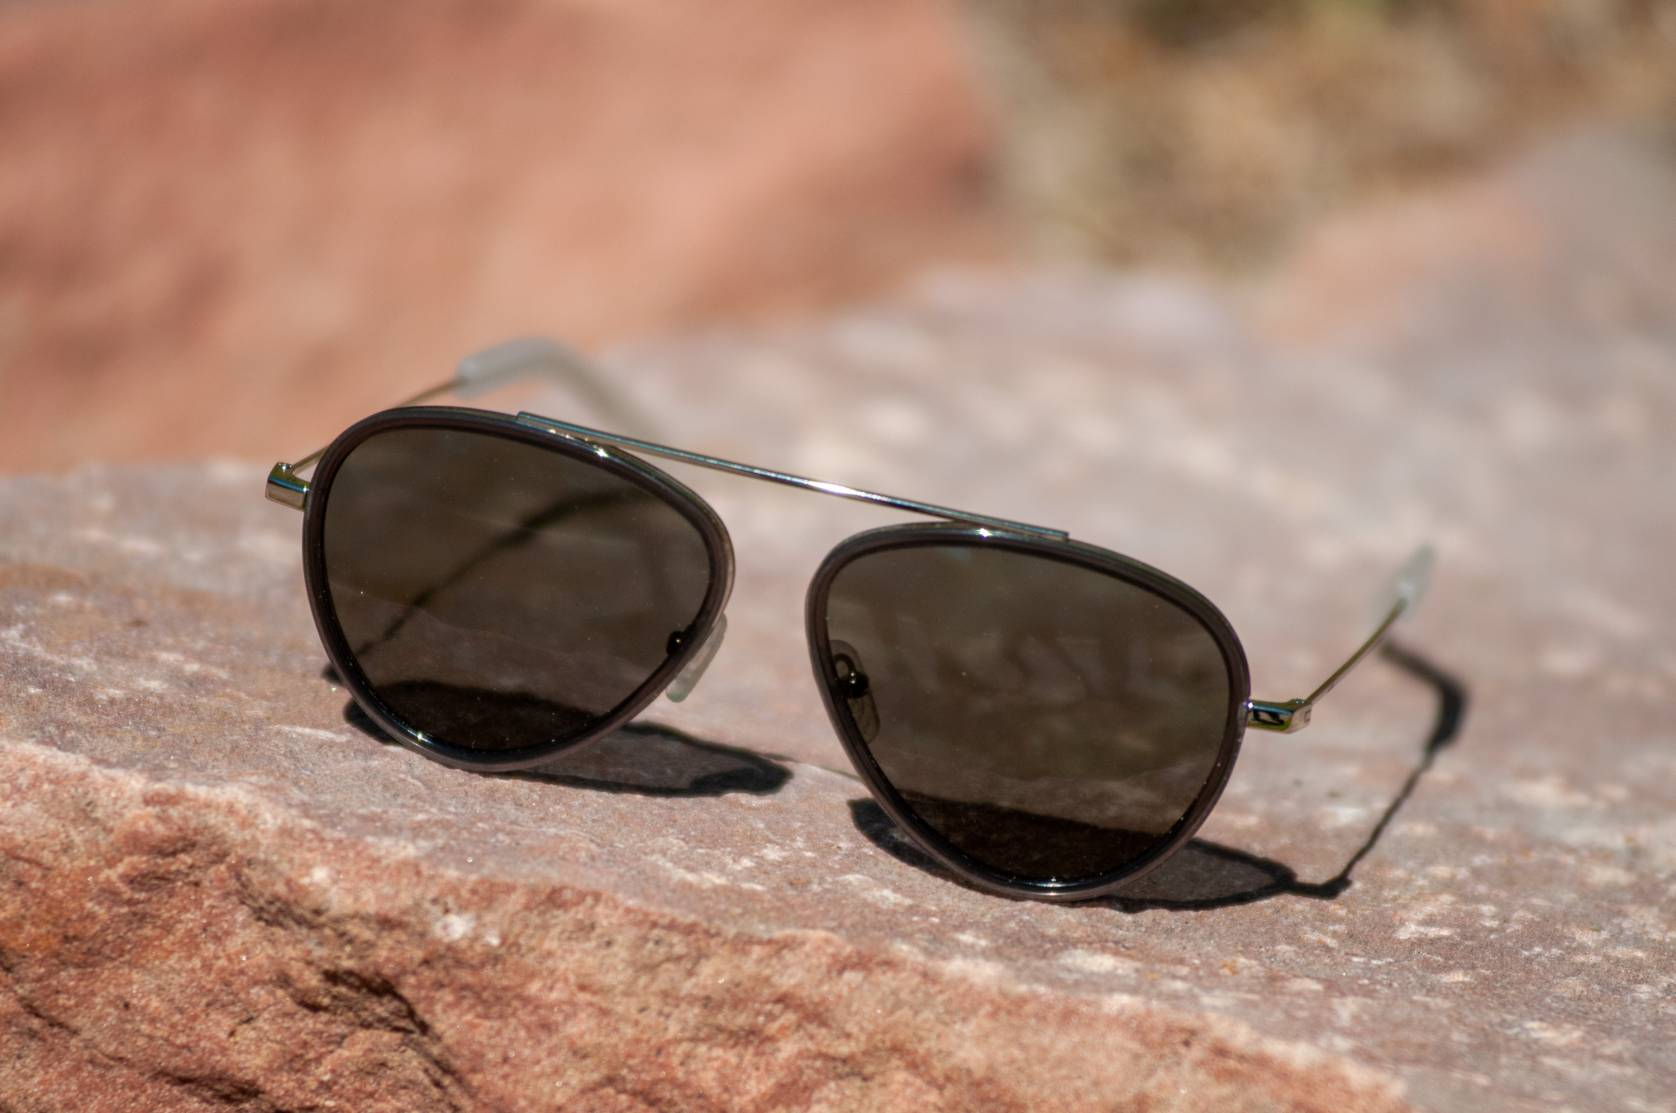 Maho Sundance aviator sunglasses